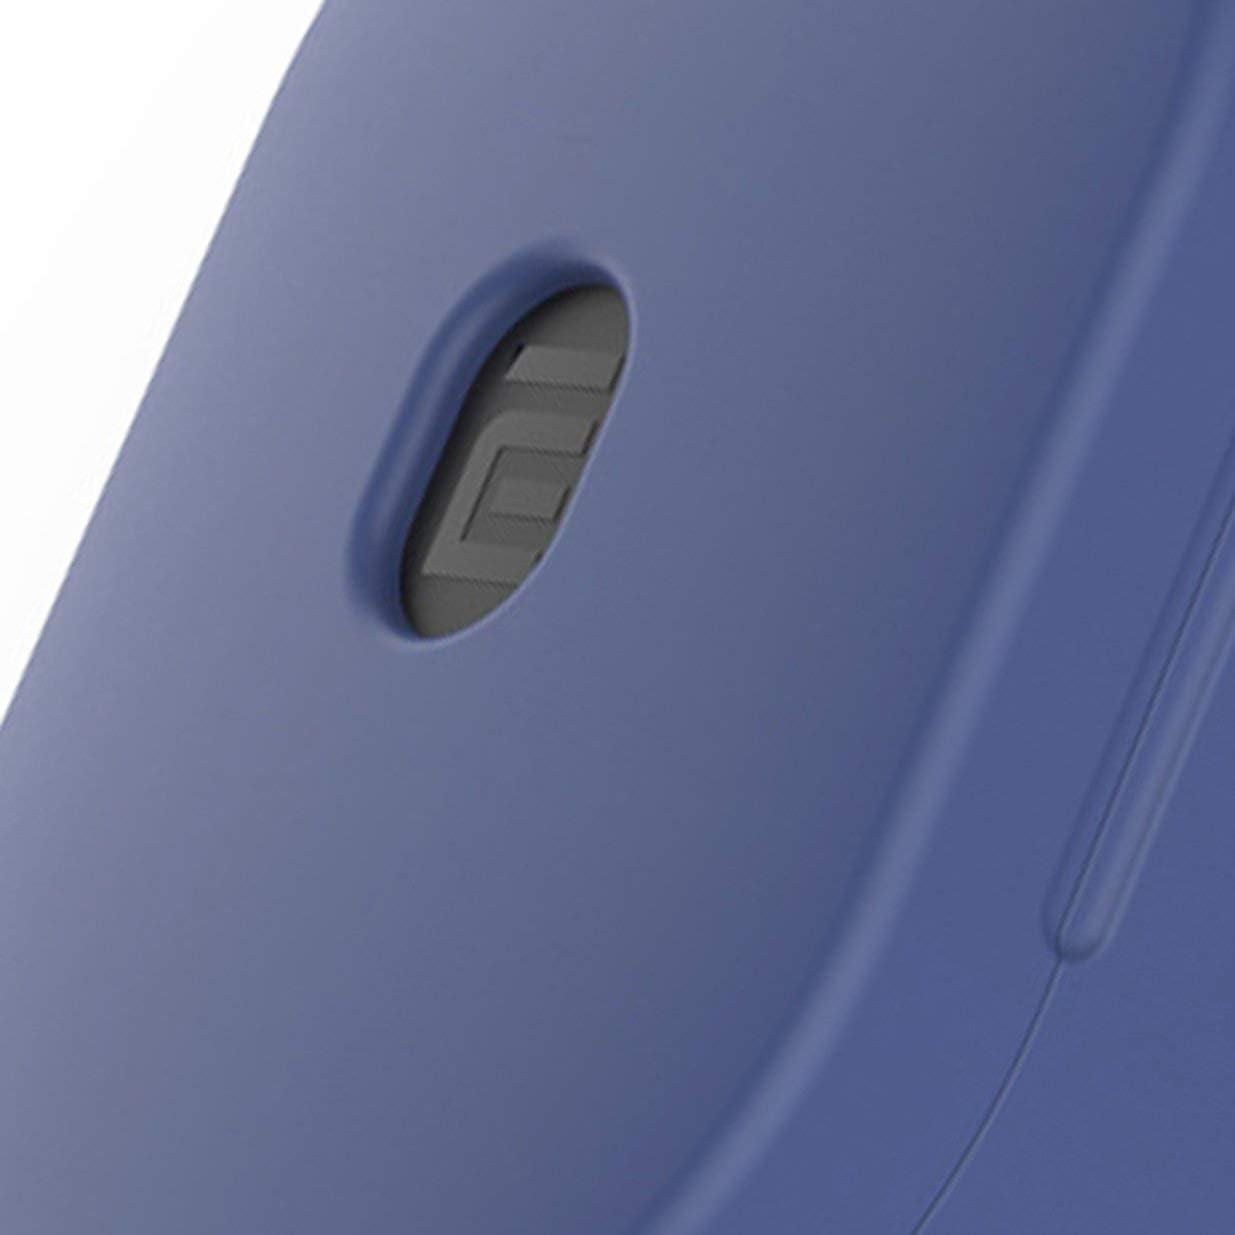 Sairis Funda Protectora de Silicona para Xiaomi Airdots Auricular Bluetooth Versi/ón Juvenil Auricular Caja Protectora